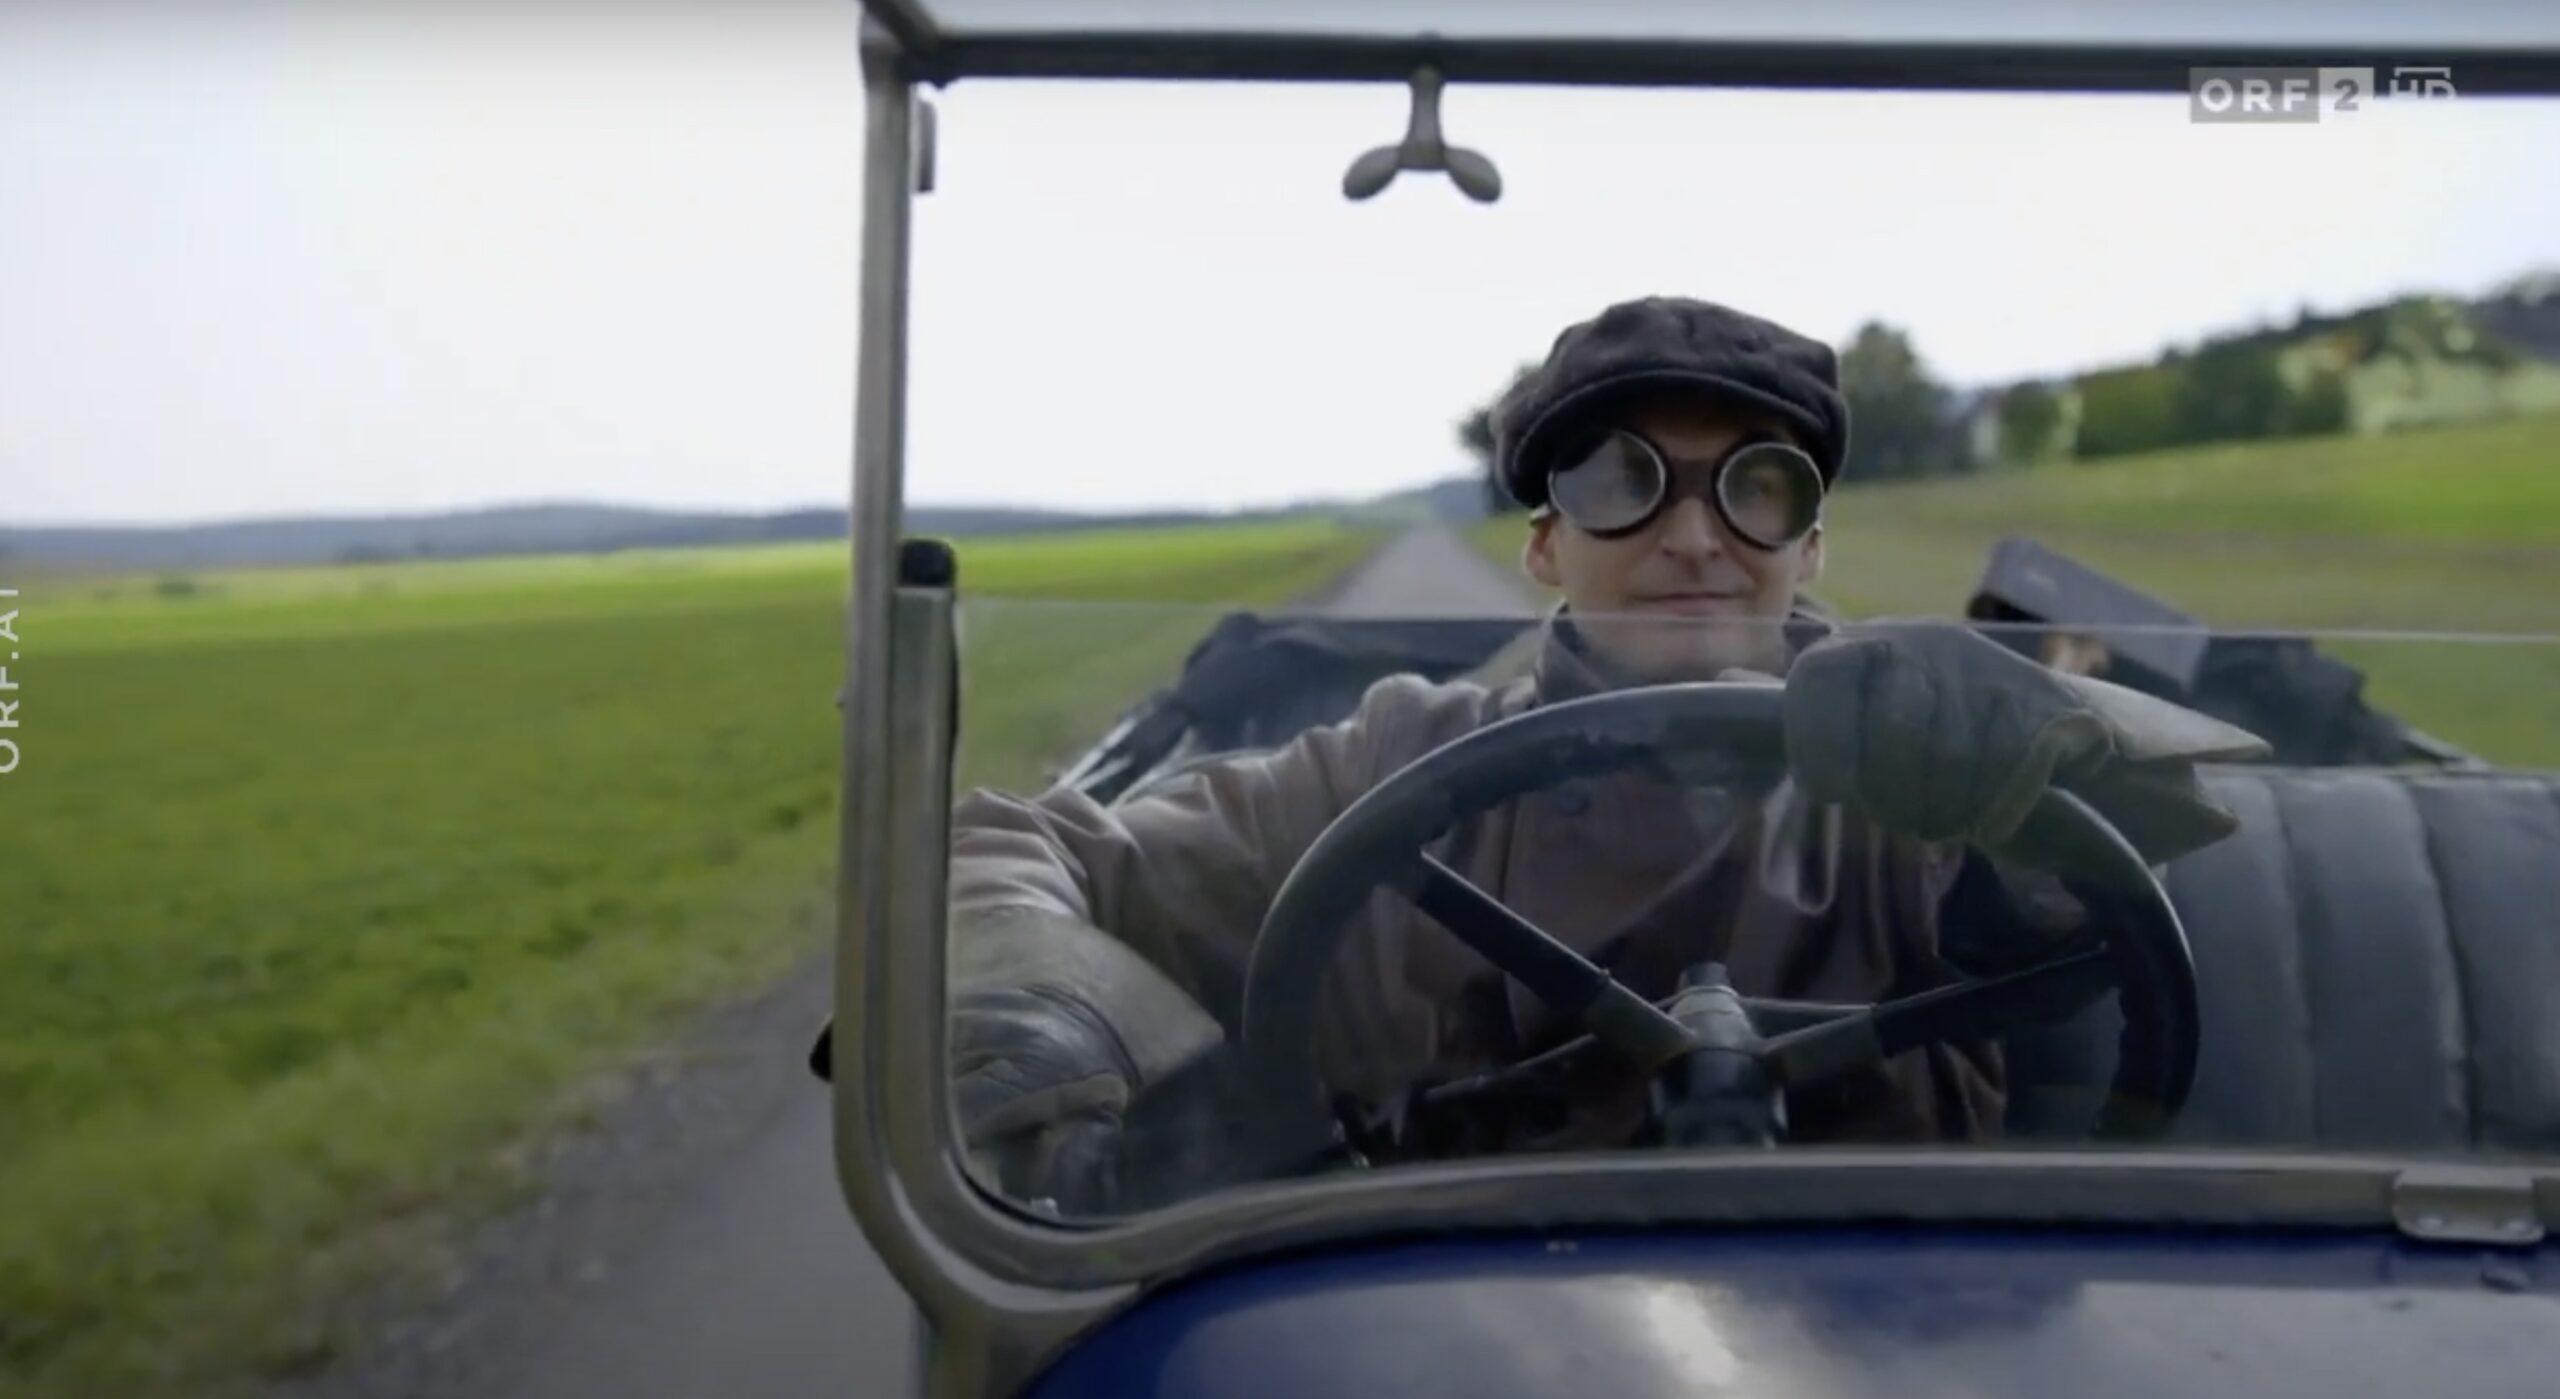 Screenshot ORF